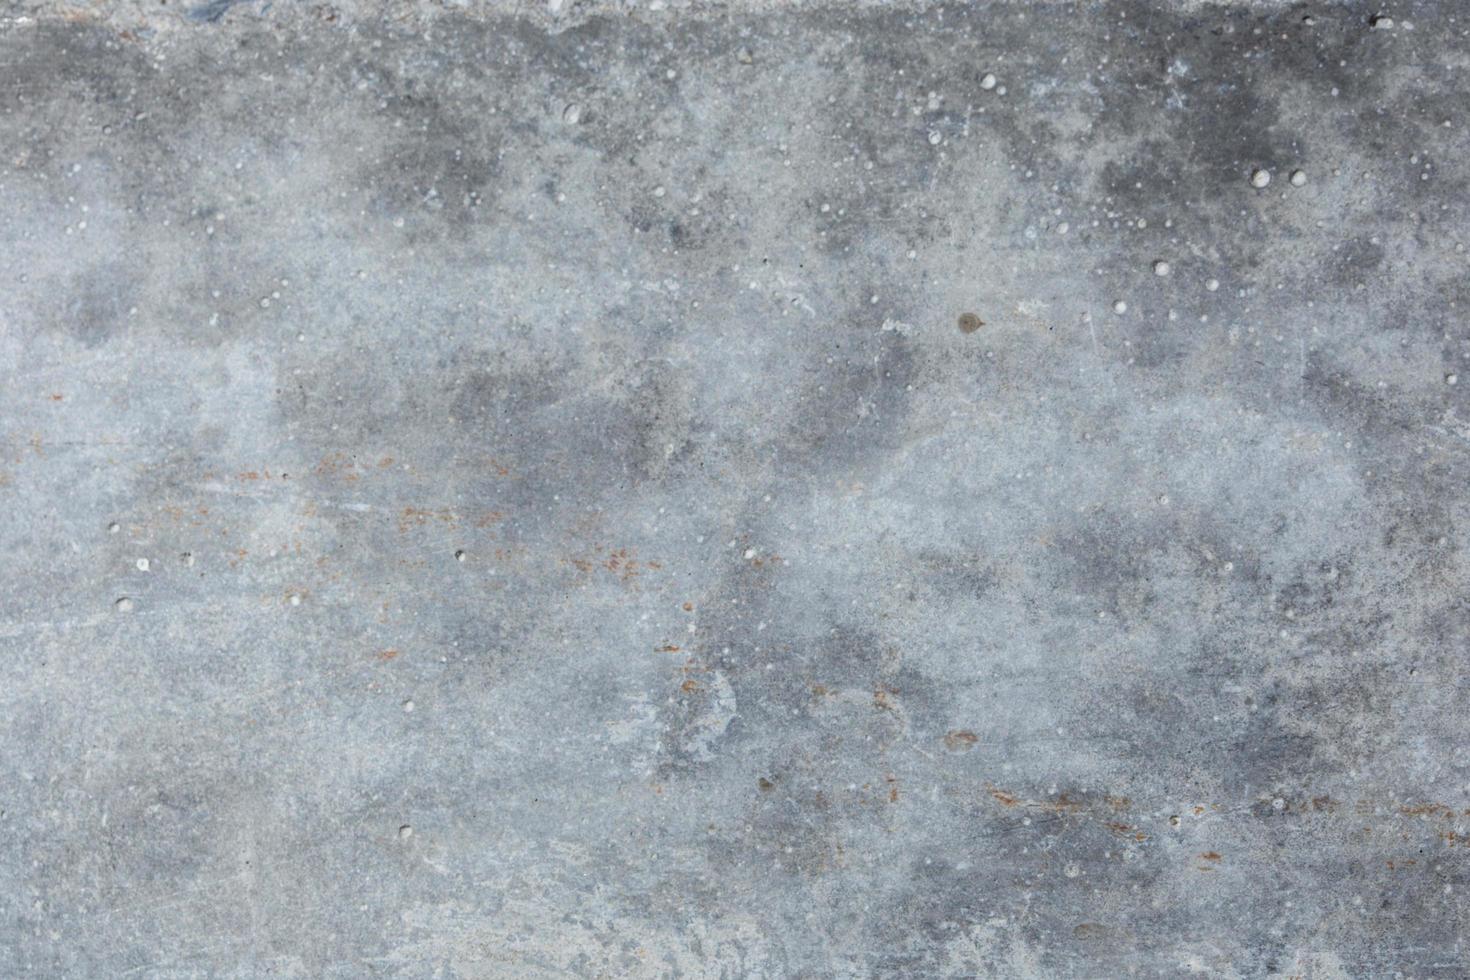 Cement floor background photo